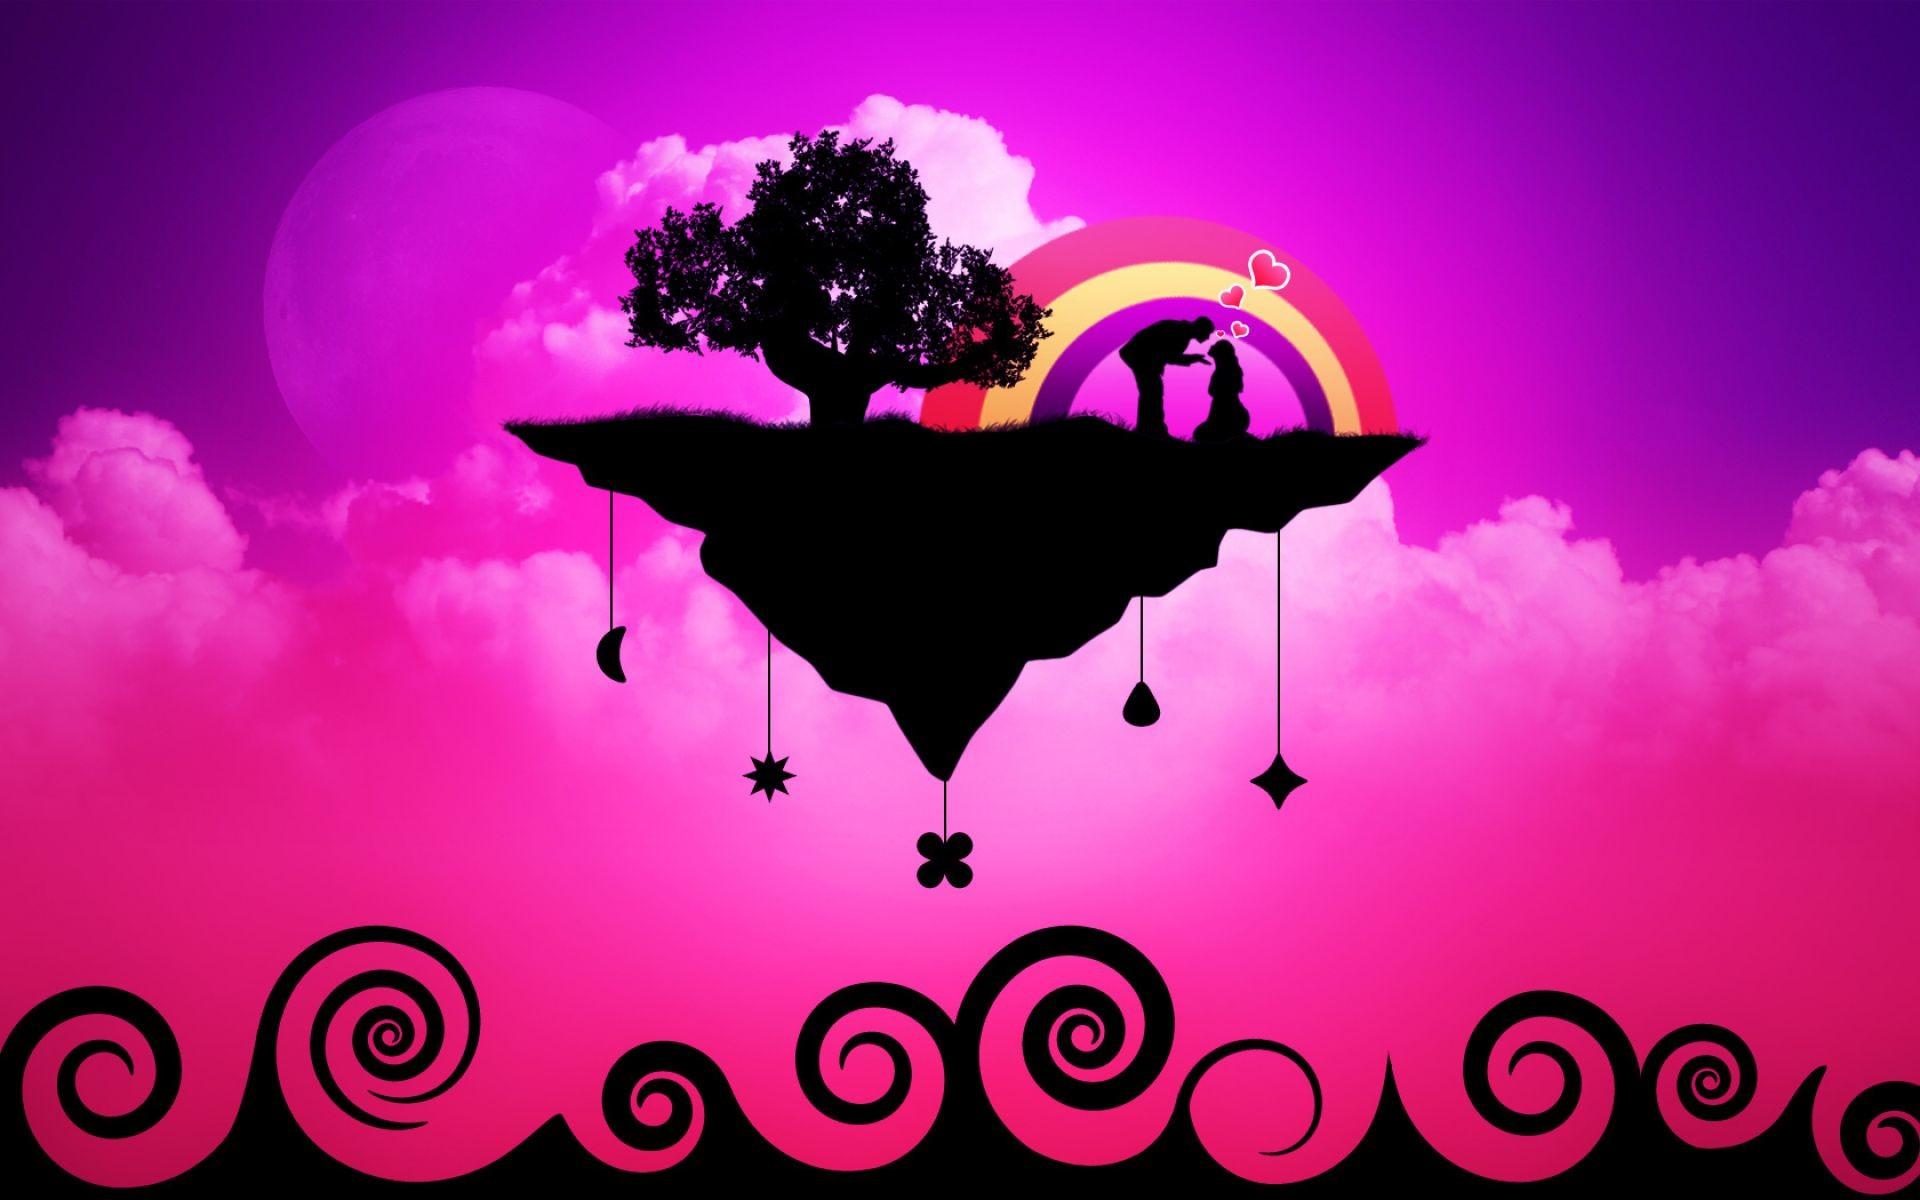 Dream Love Wallpaper | HD Love Wallpaper Free Download …